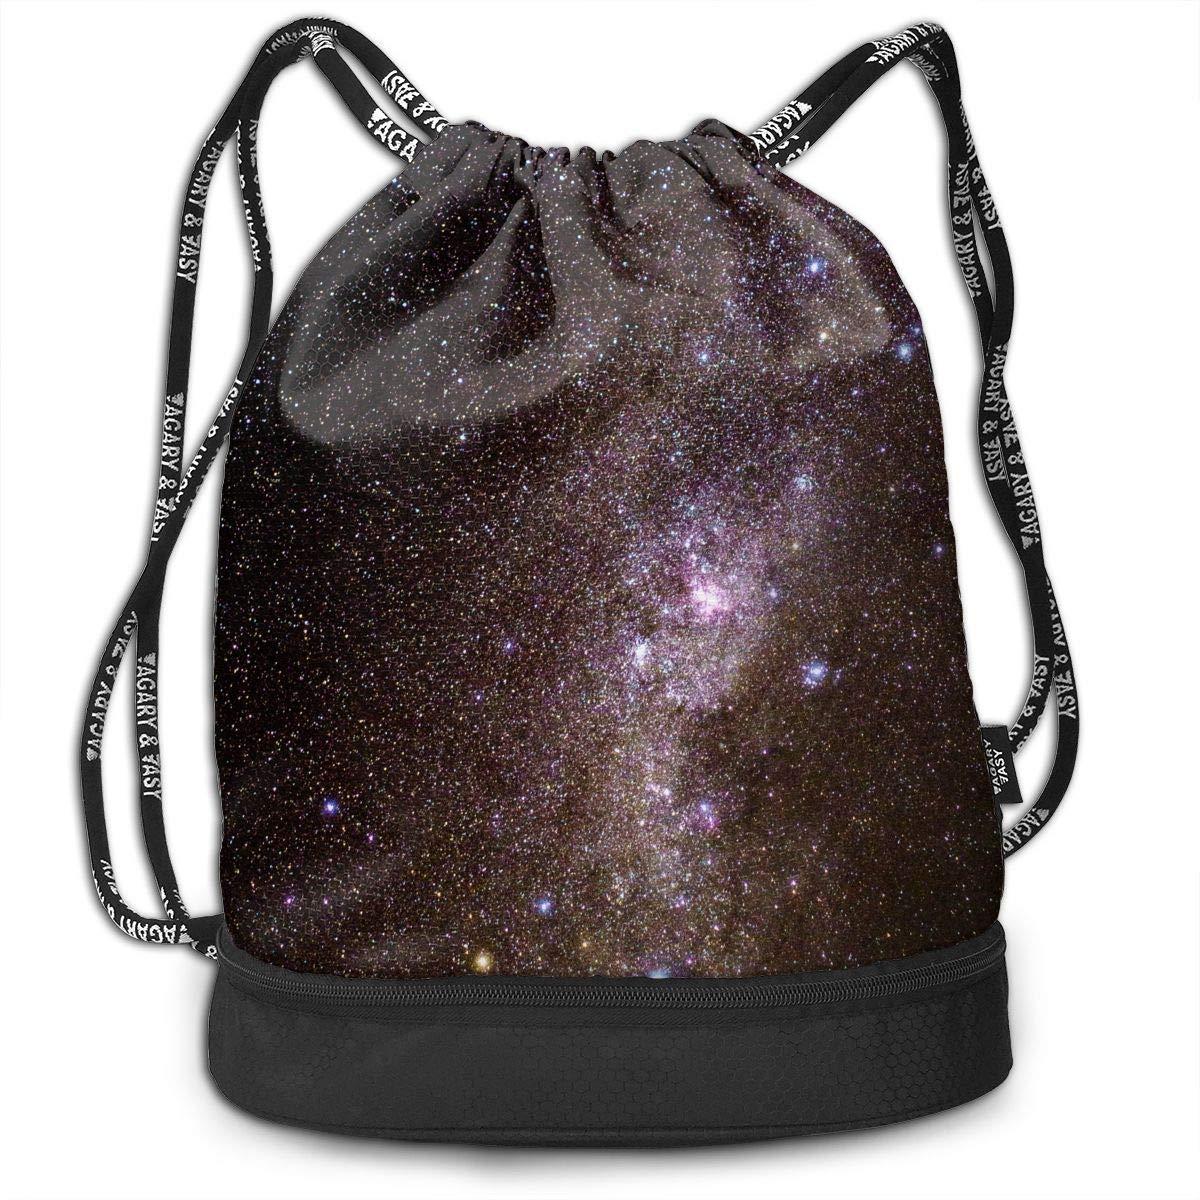 RAINNY Night Sky Scenery Large Drawstring Sport Backpack Sack Bag Sackpack